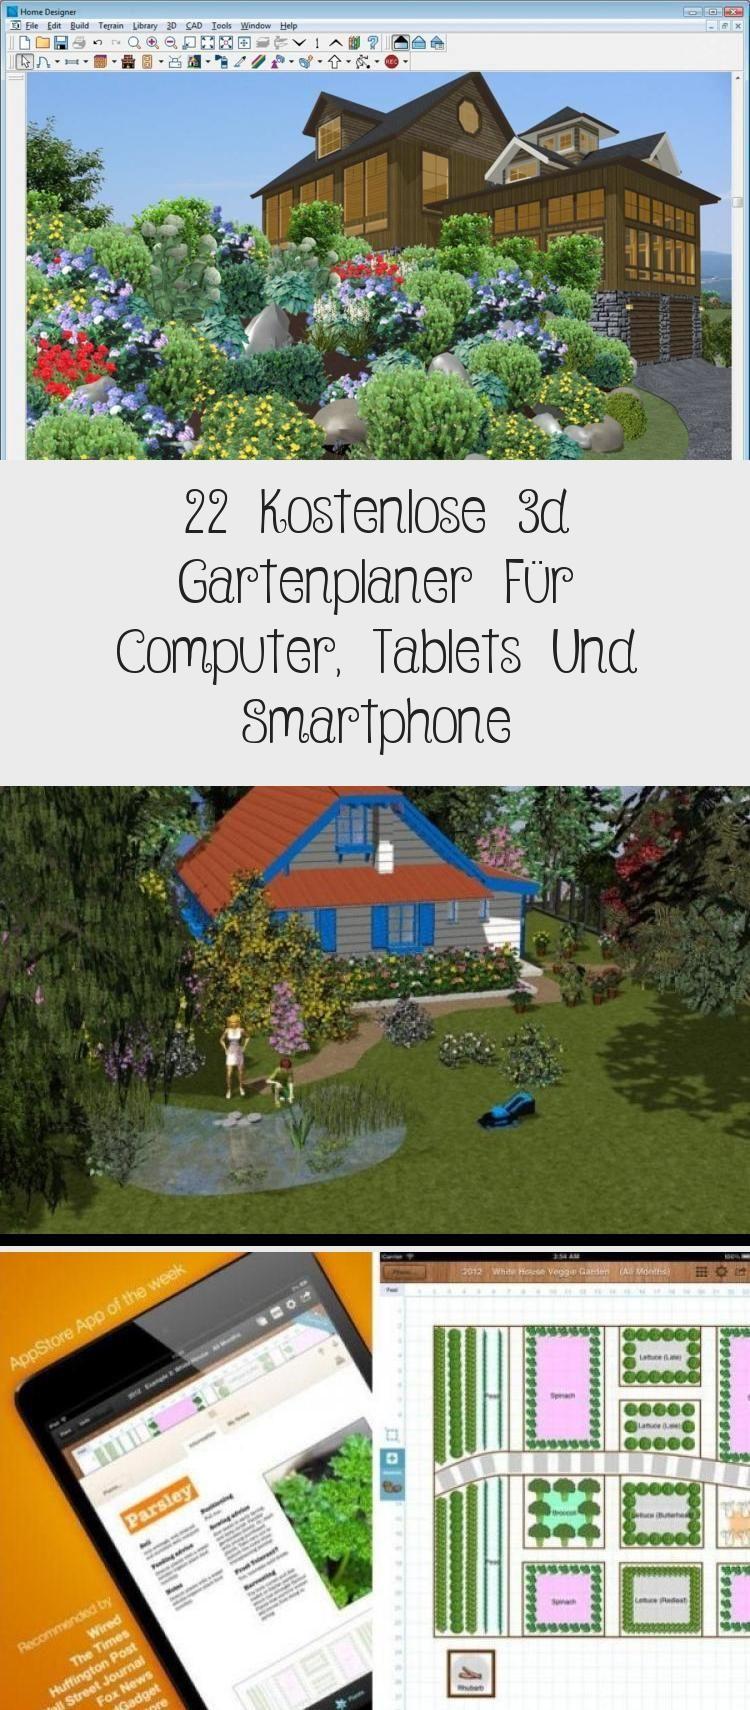 22 Kostenlose 3d Gartenplaner Fur Computer Tablets Und Smartphone In 2020 Smartphone App Tablet